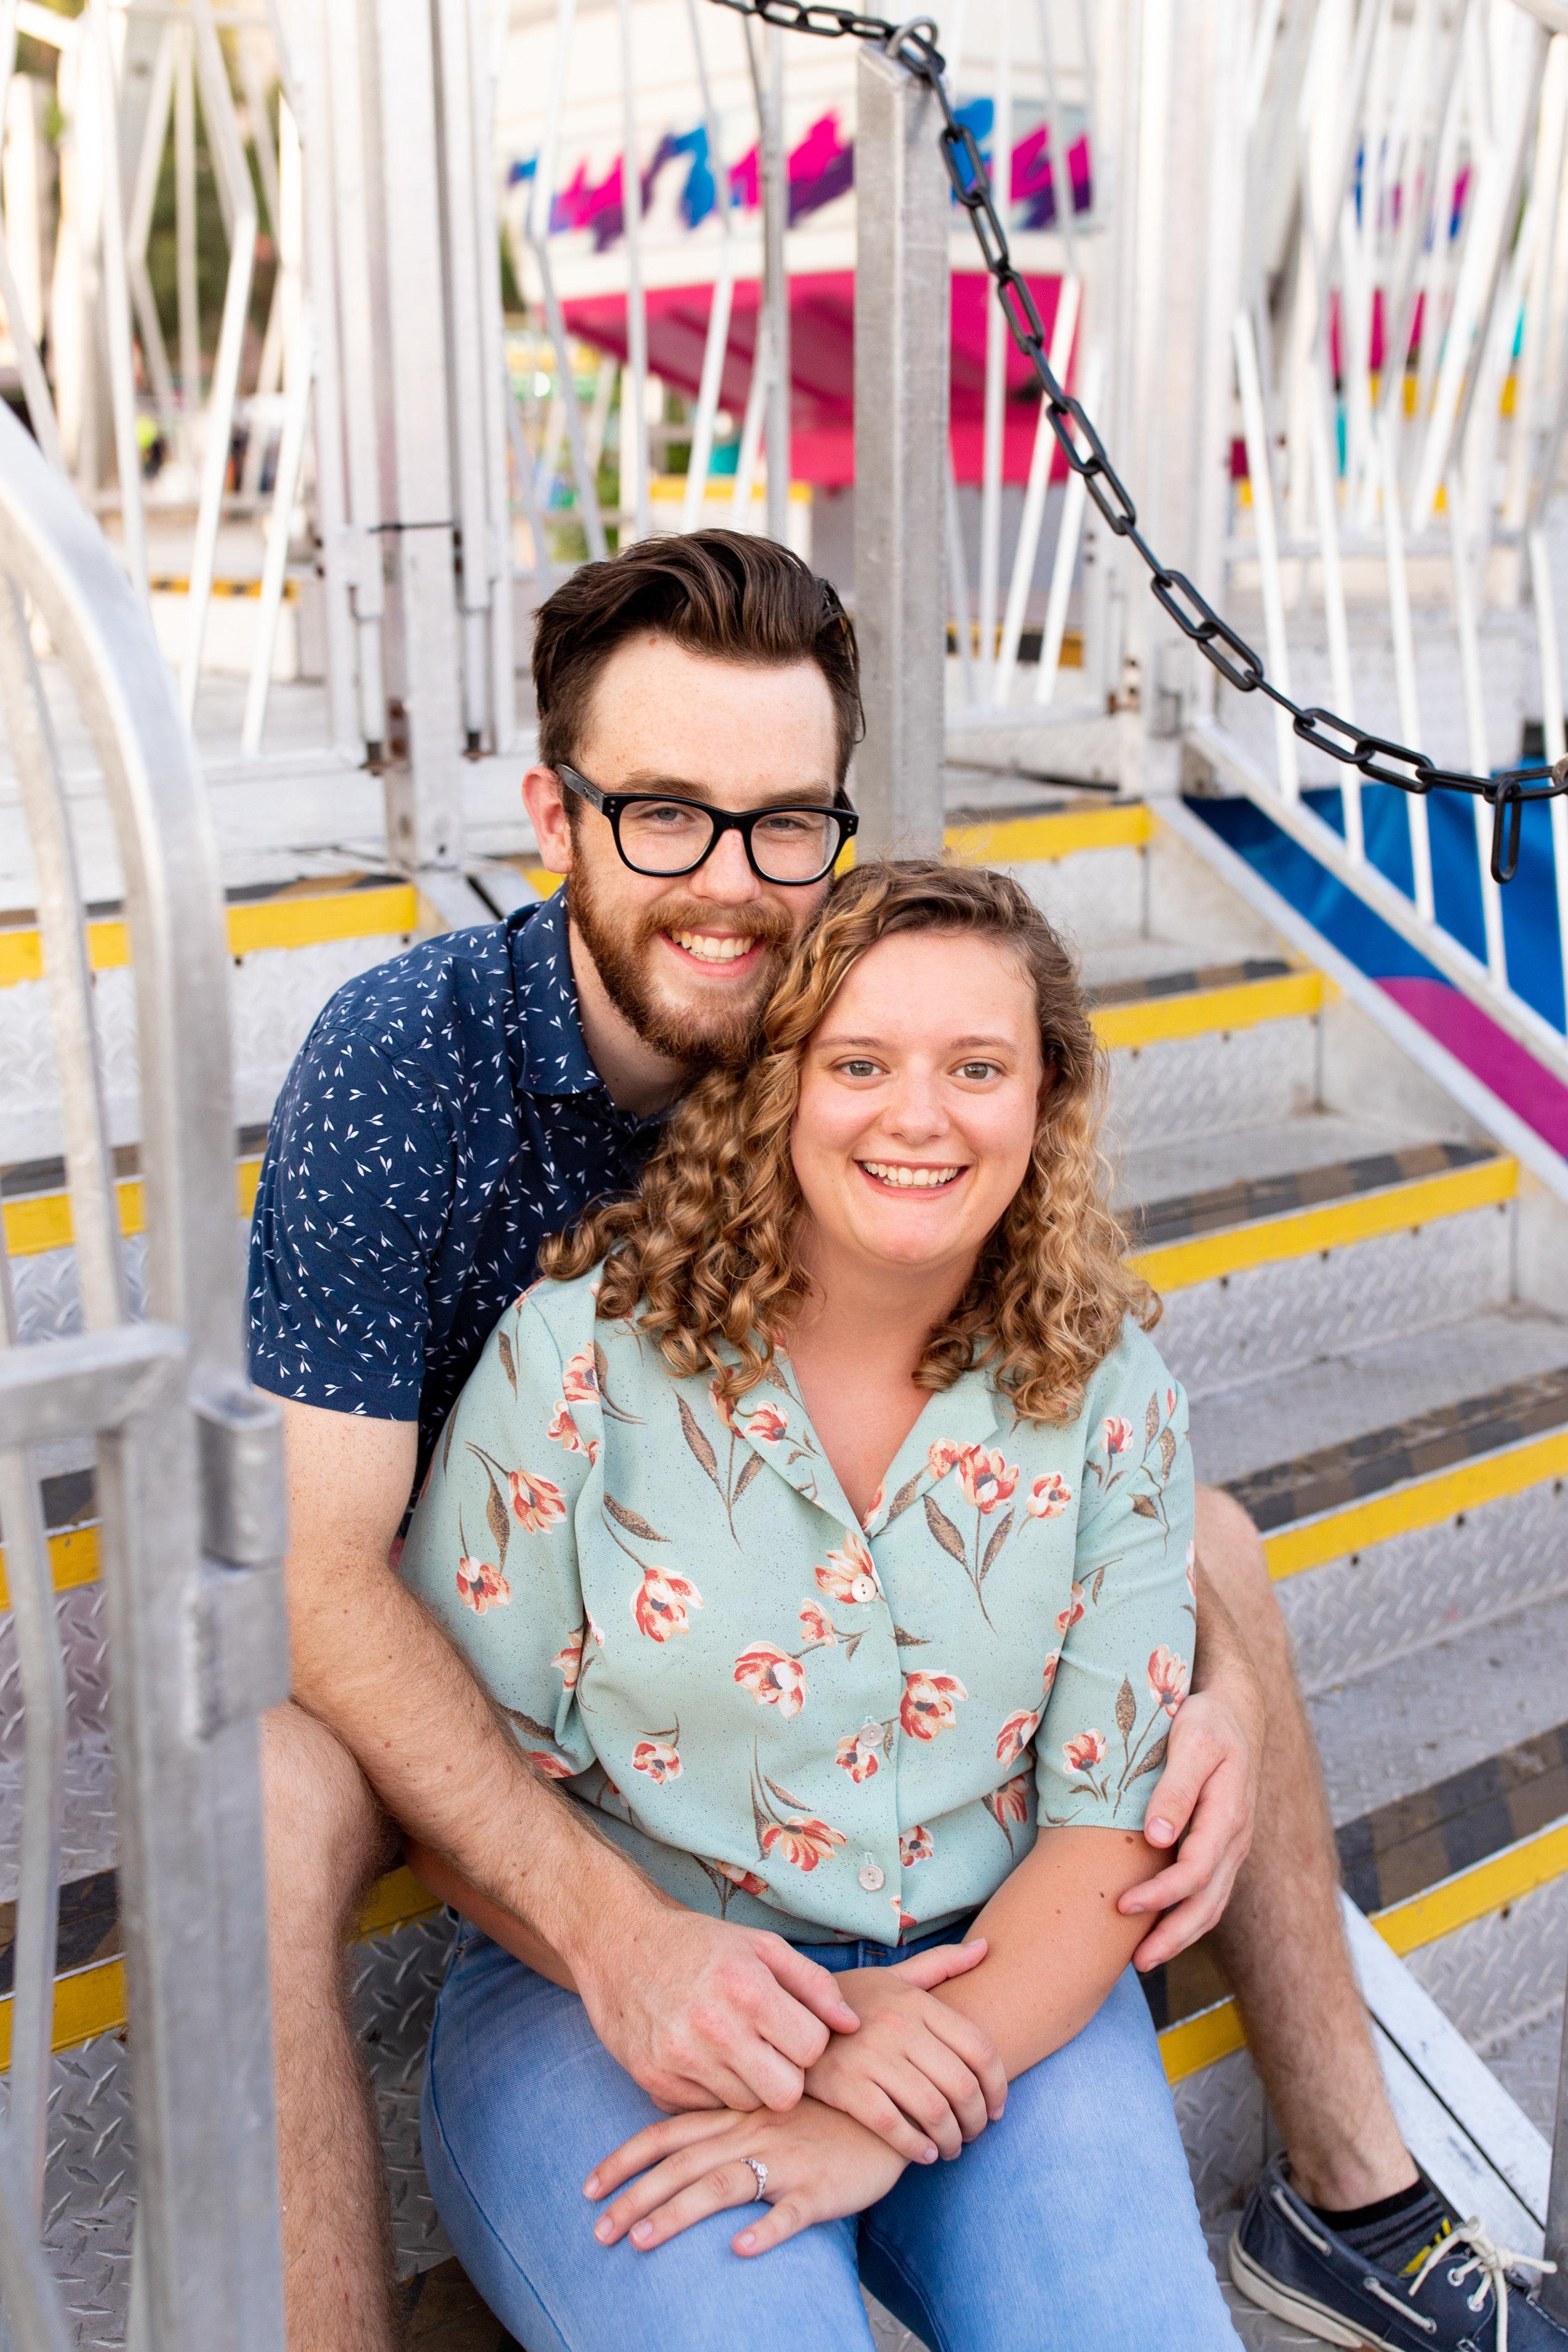 CarolineBabcockPhotography_Max&Sarah_0819-28.jpg